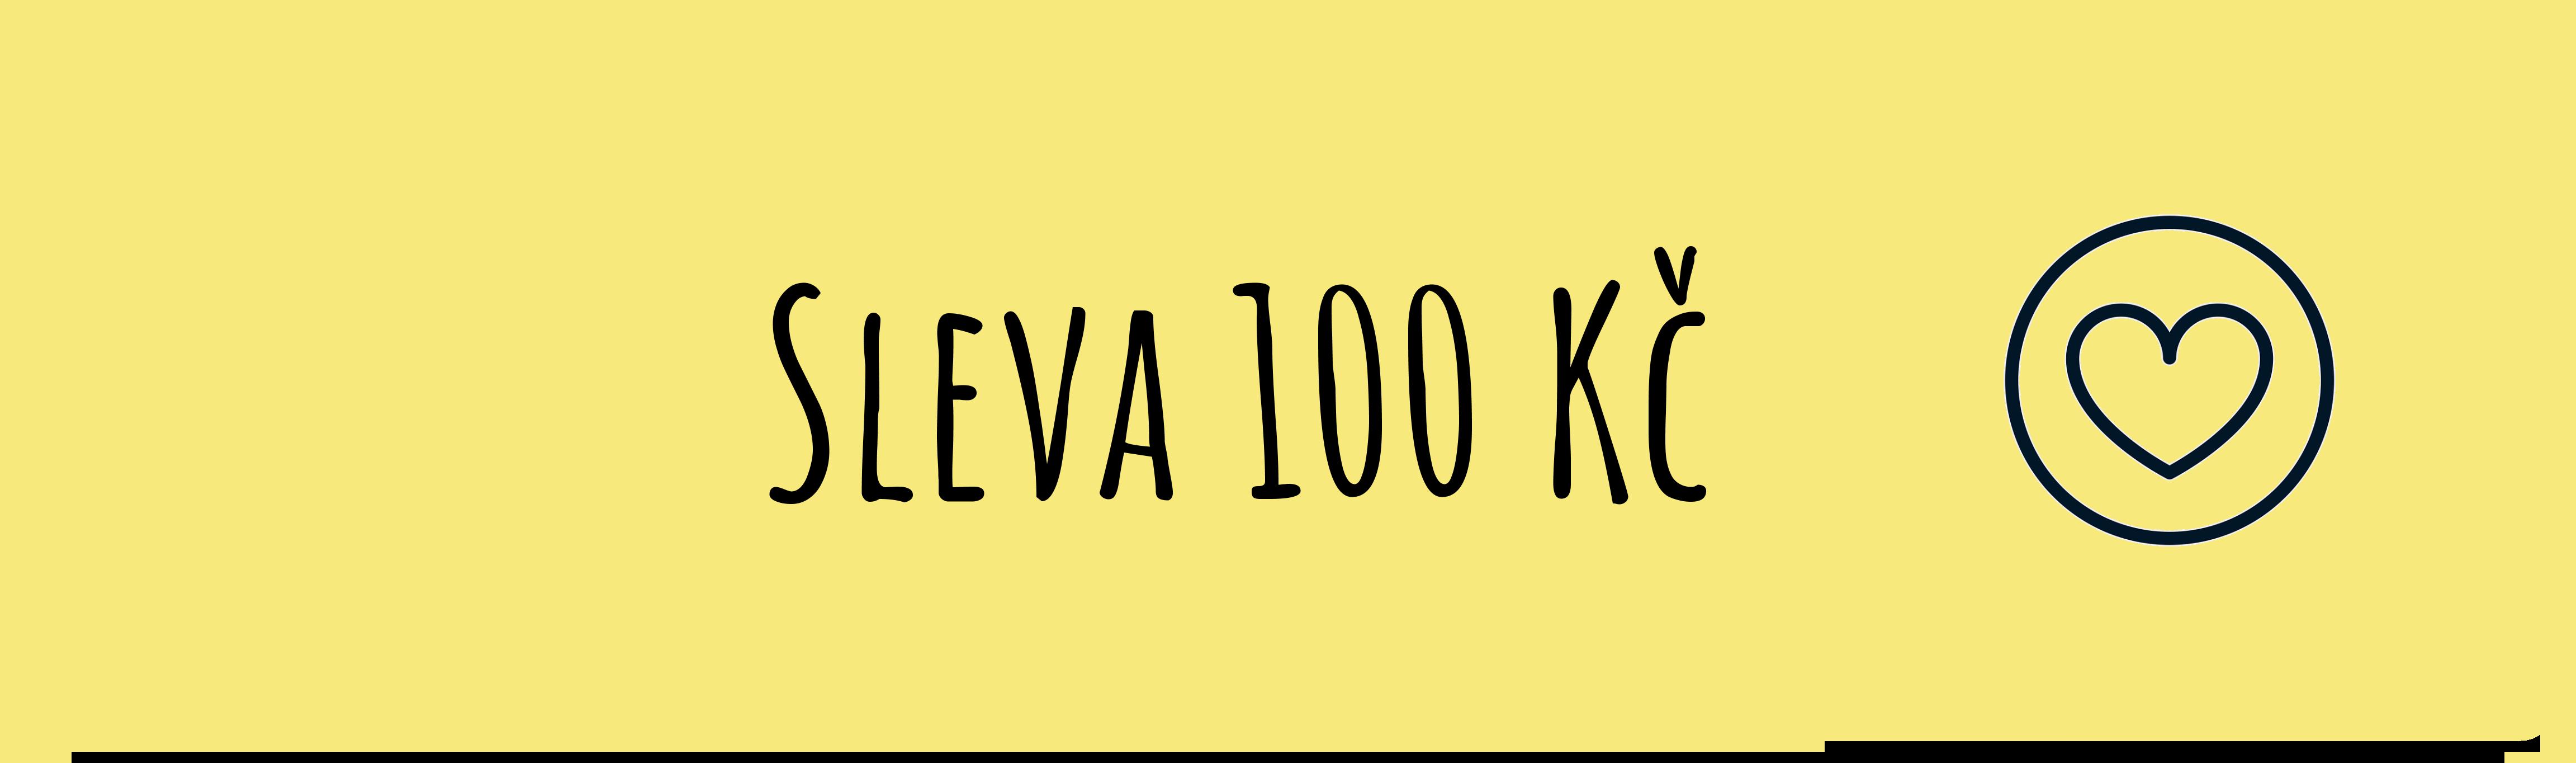 Sleva_100_Kč_MADE_BY_DOMARA